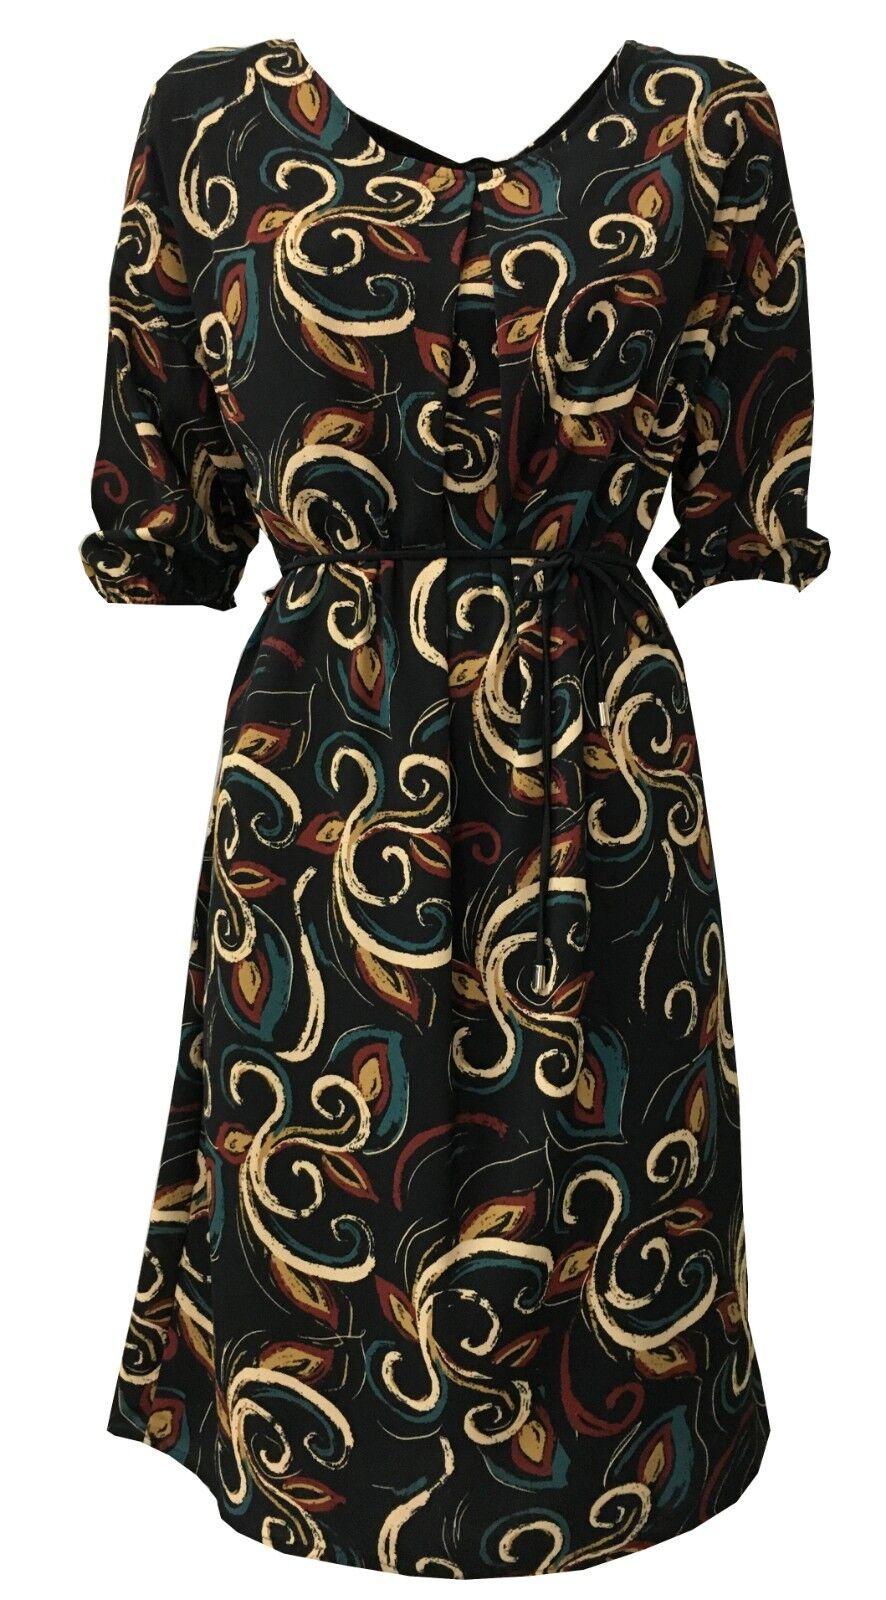 LA FEE MARABOUTEE Kleid Frau schwarz Fantasie mod FB1738 MADE IN ITALY